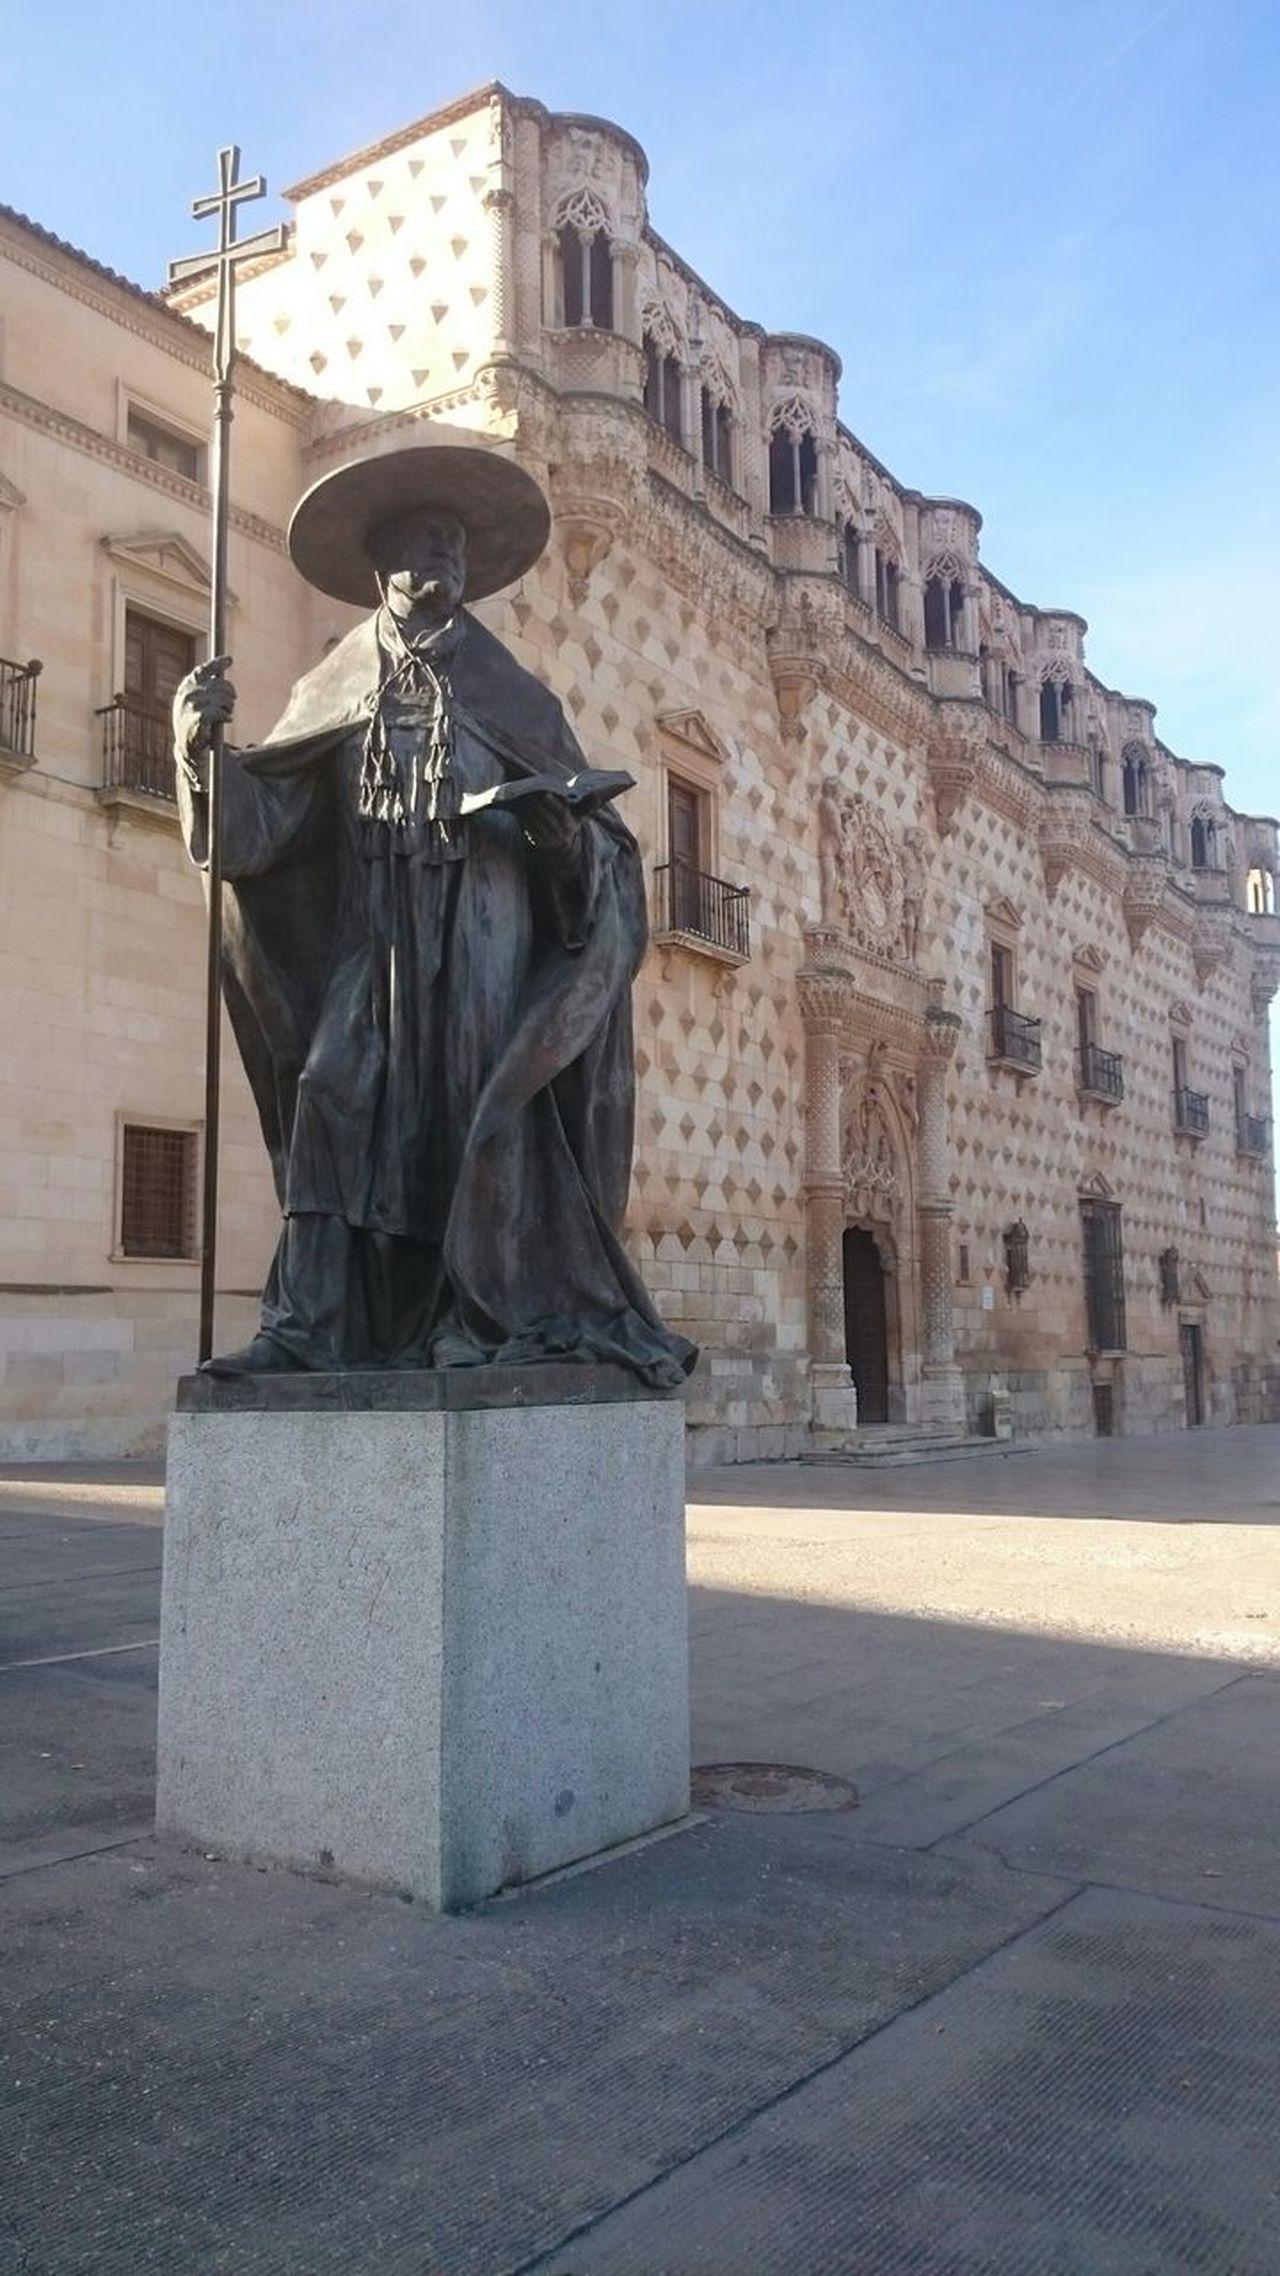 Fachada Y Escultura Cardenal Mendoza The Traveler - 2015 EyeEm Awards Palais Palacio Palazzo Palace Palacio Del Infantado